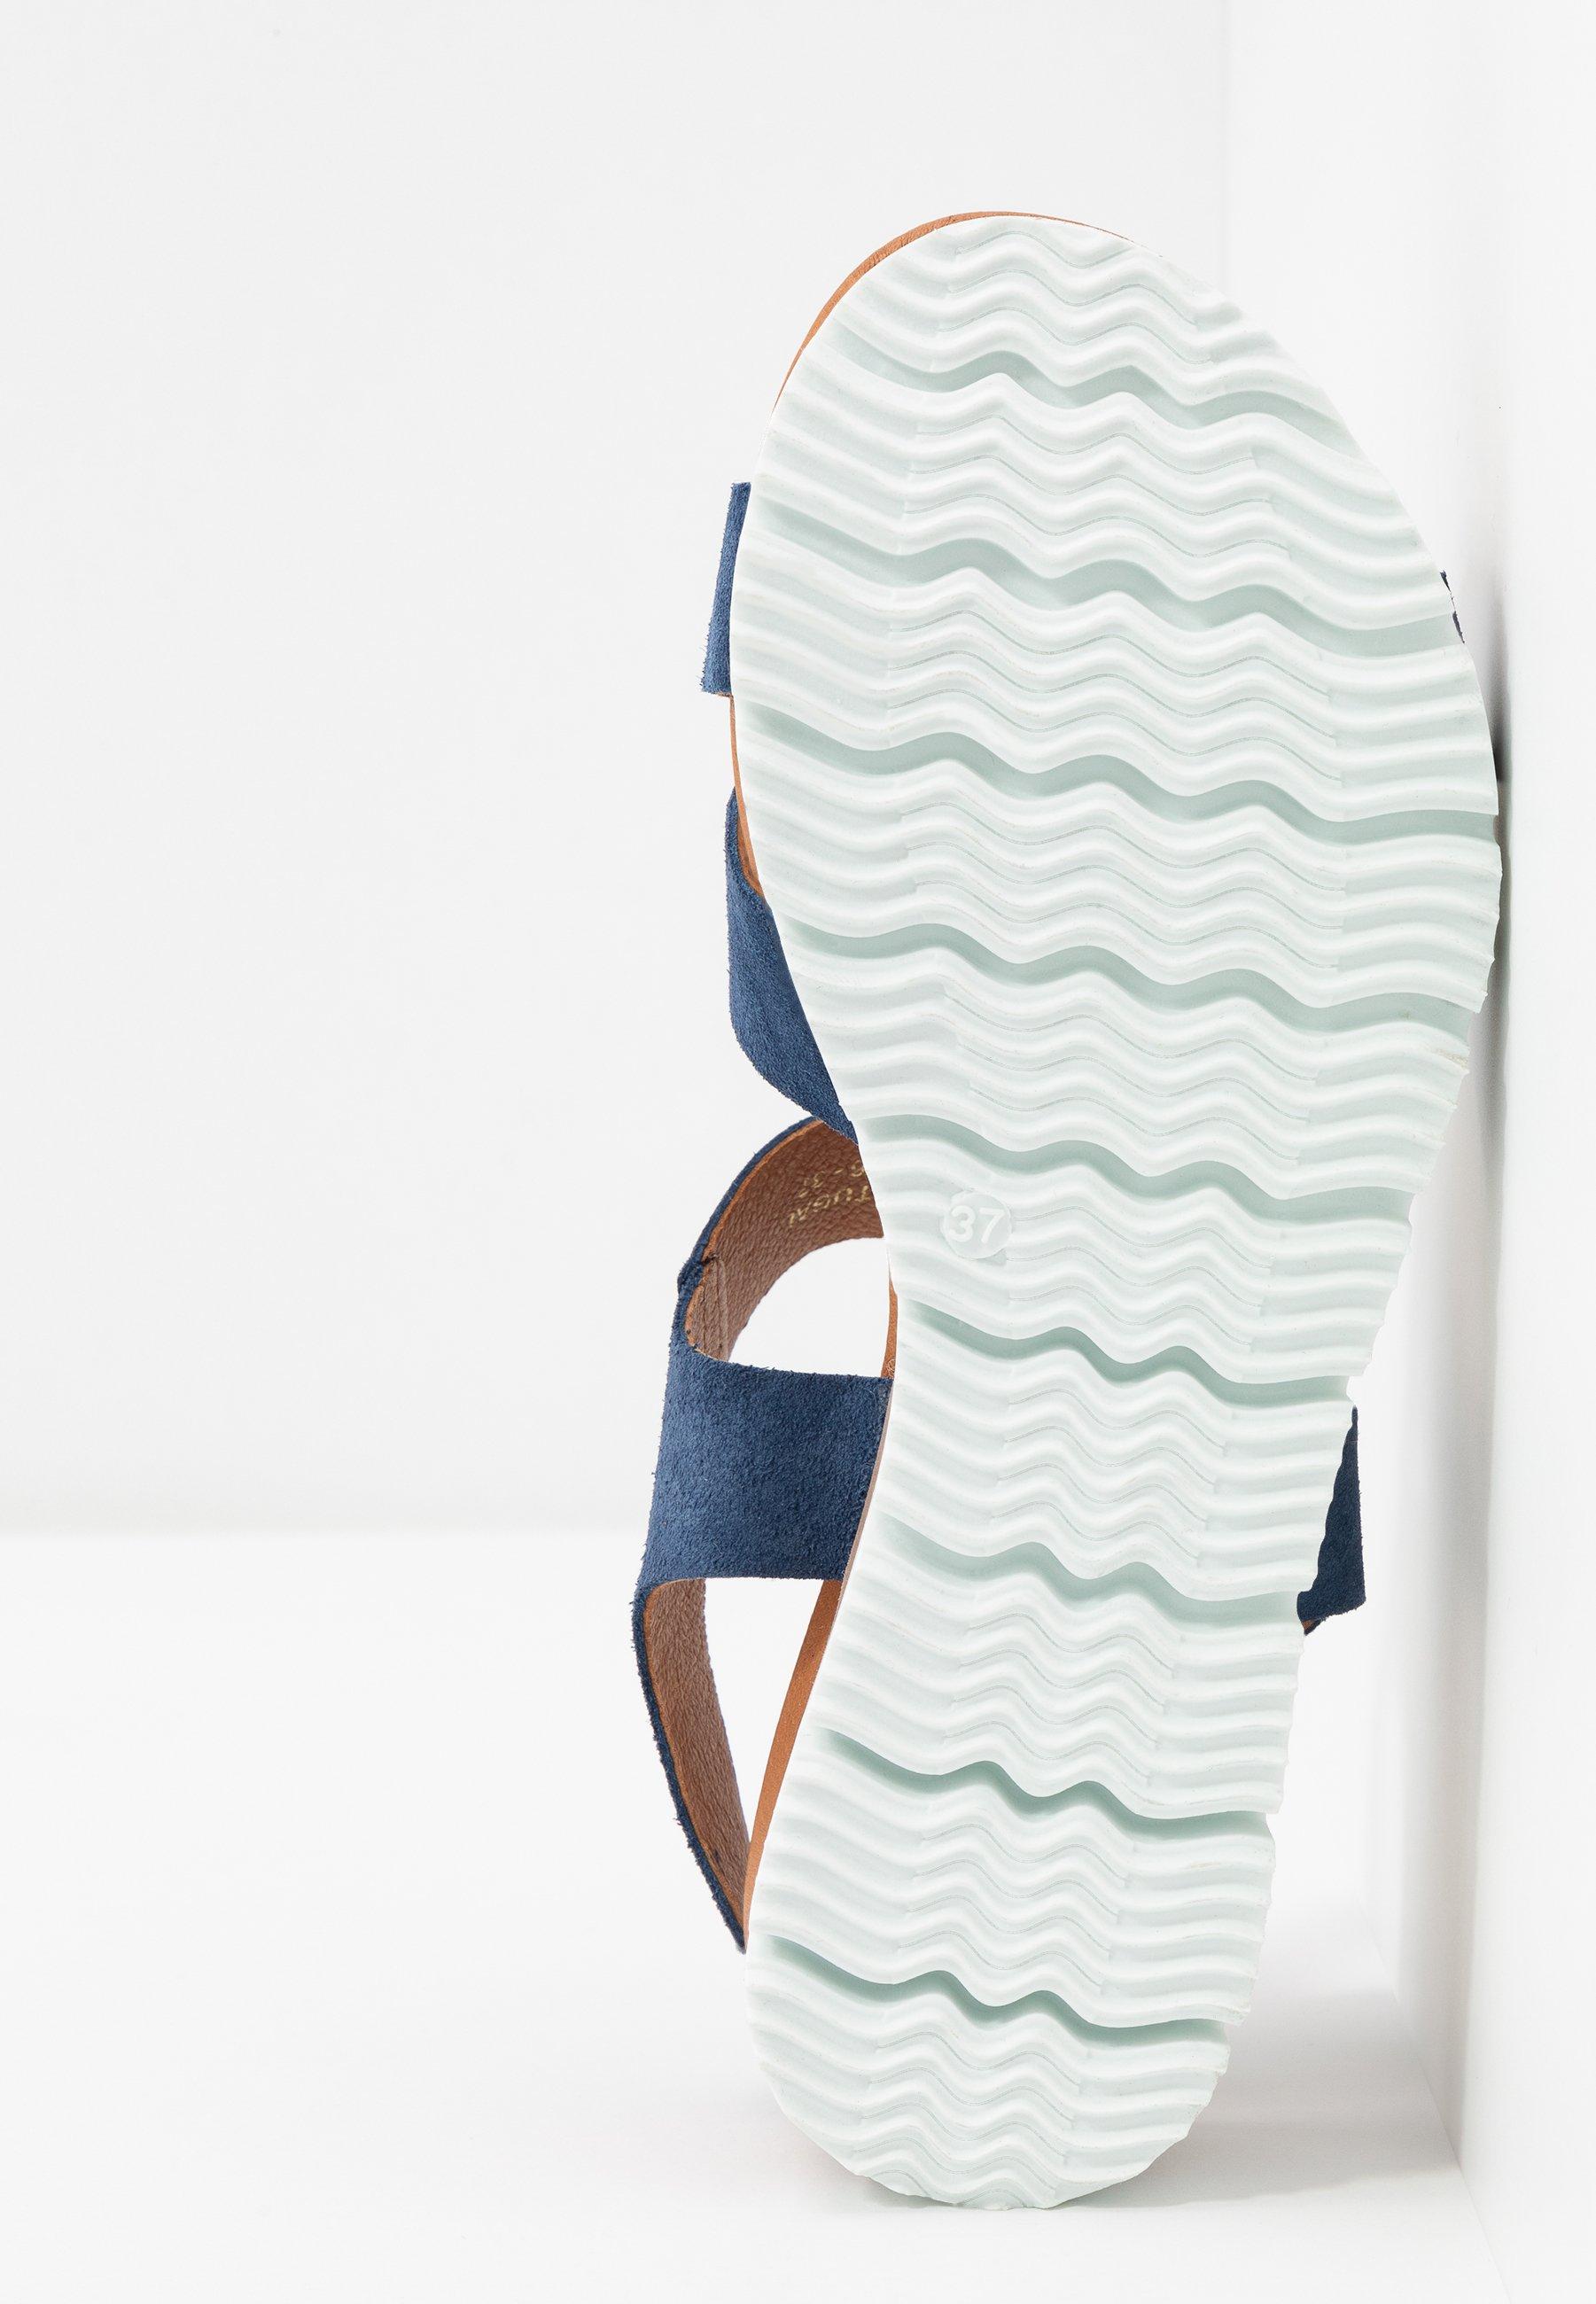 Women BIADEBRA SUEDE SANDAL - Sandals - light blue